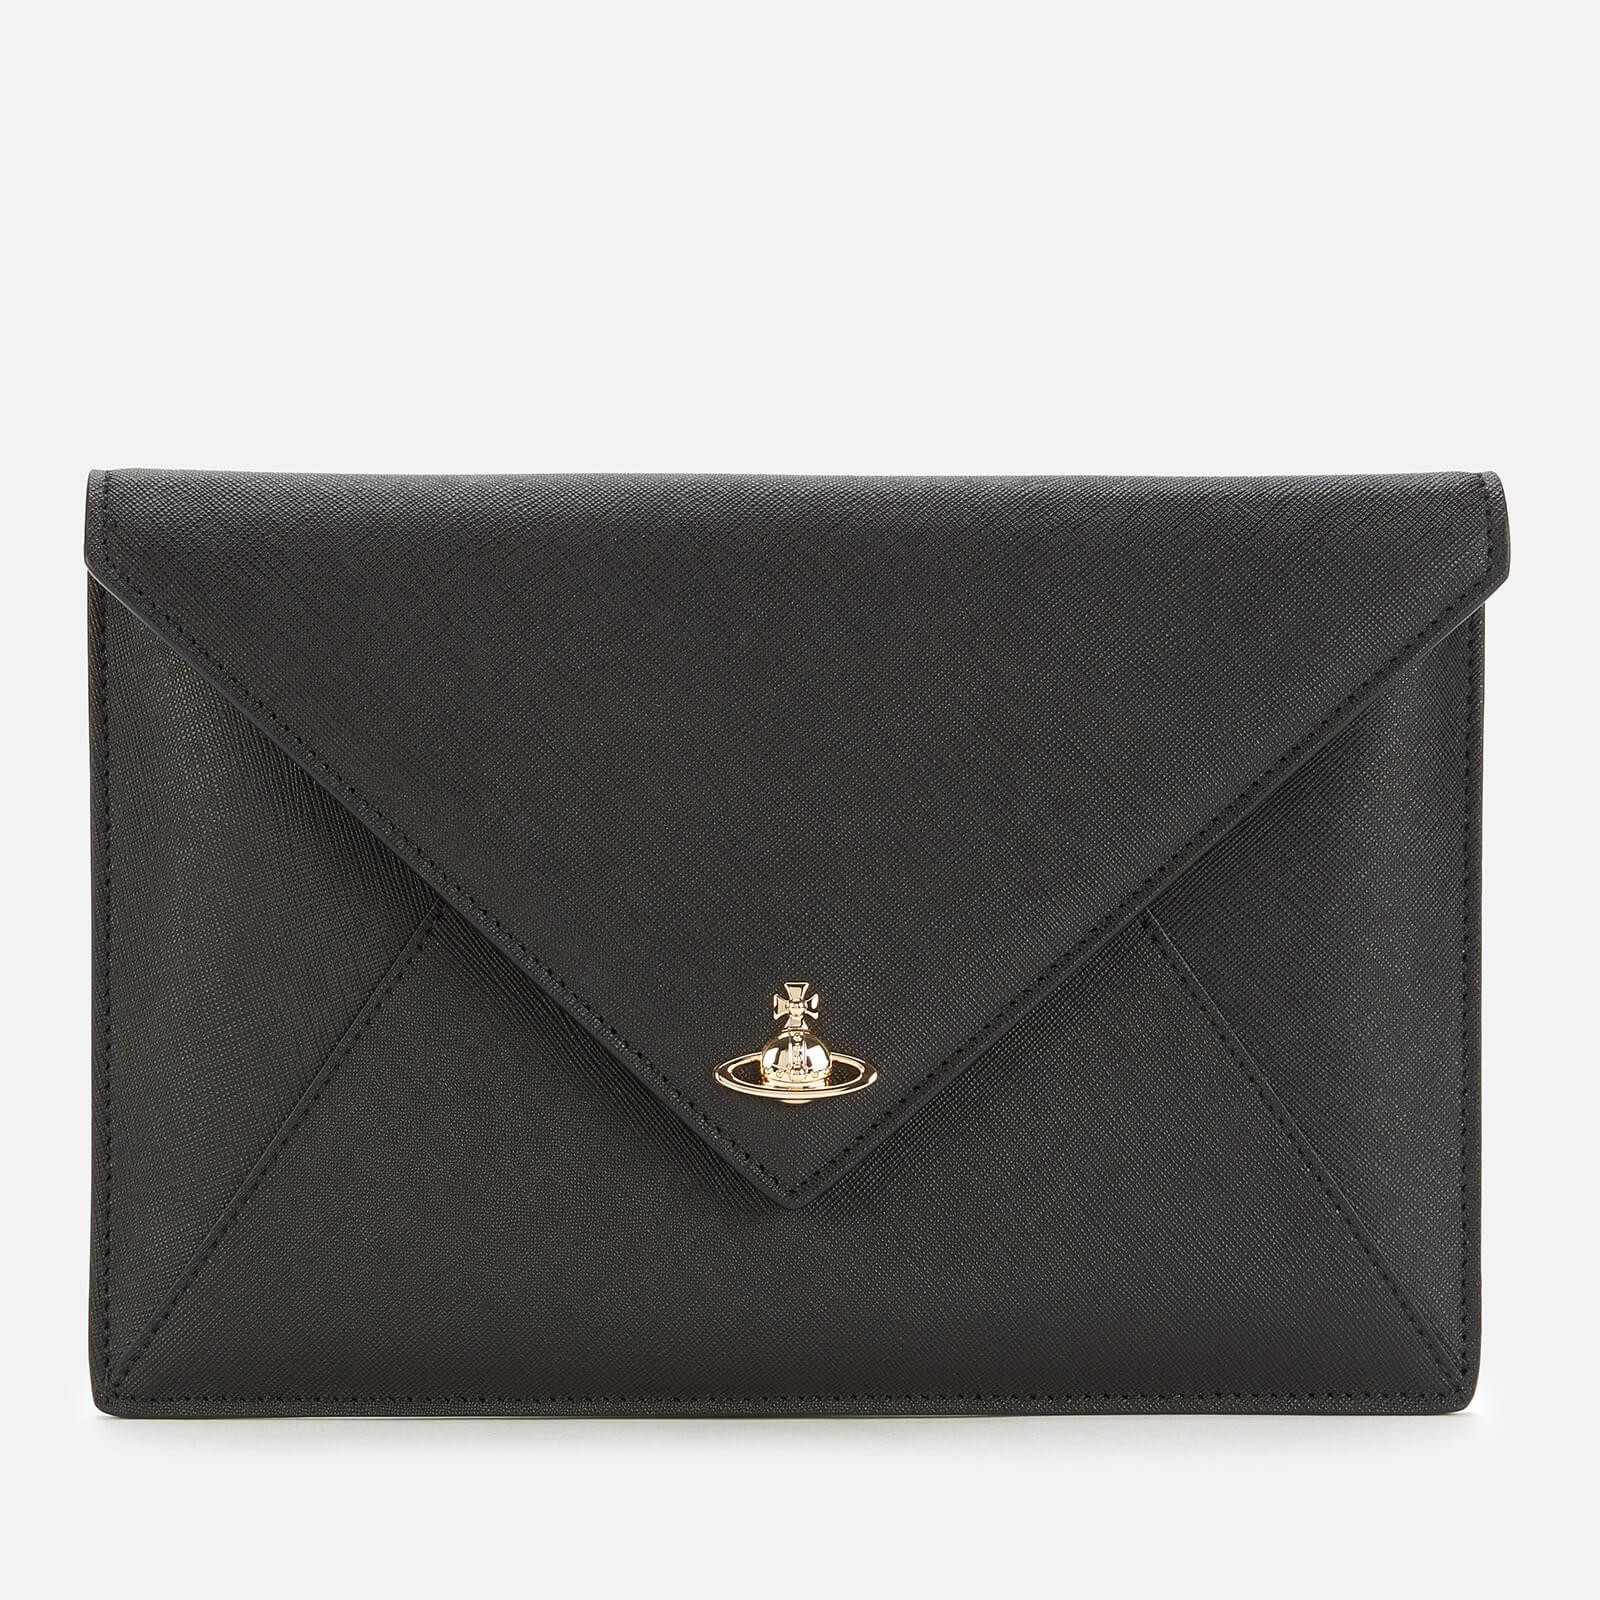 Vivienne Westwood Women's Victoria Envelope Clutch Bag - Black